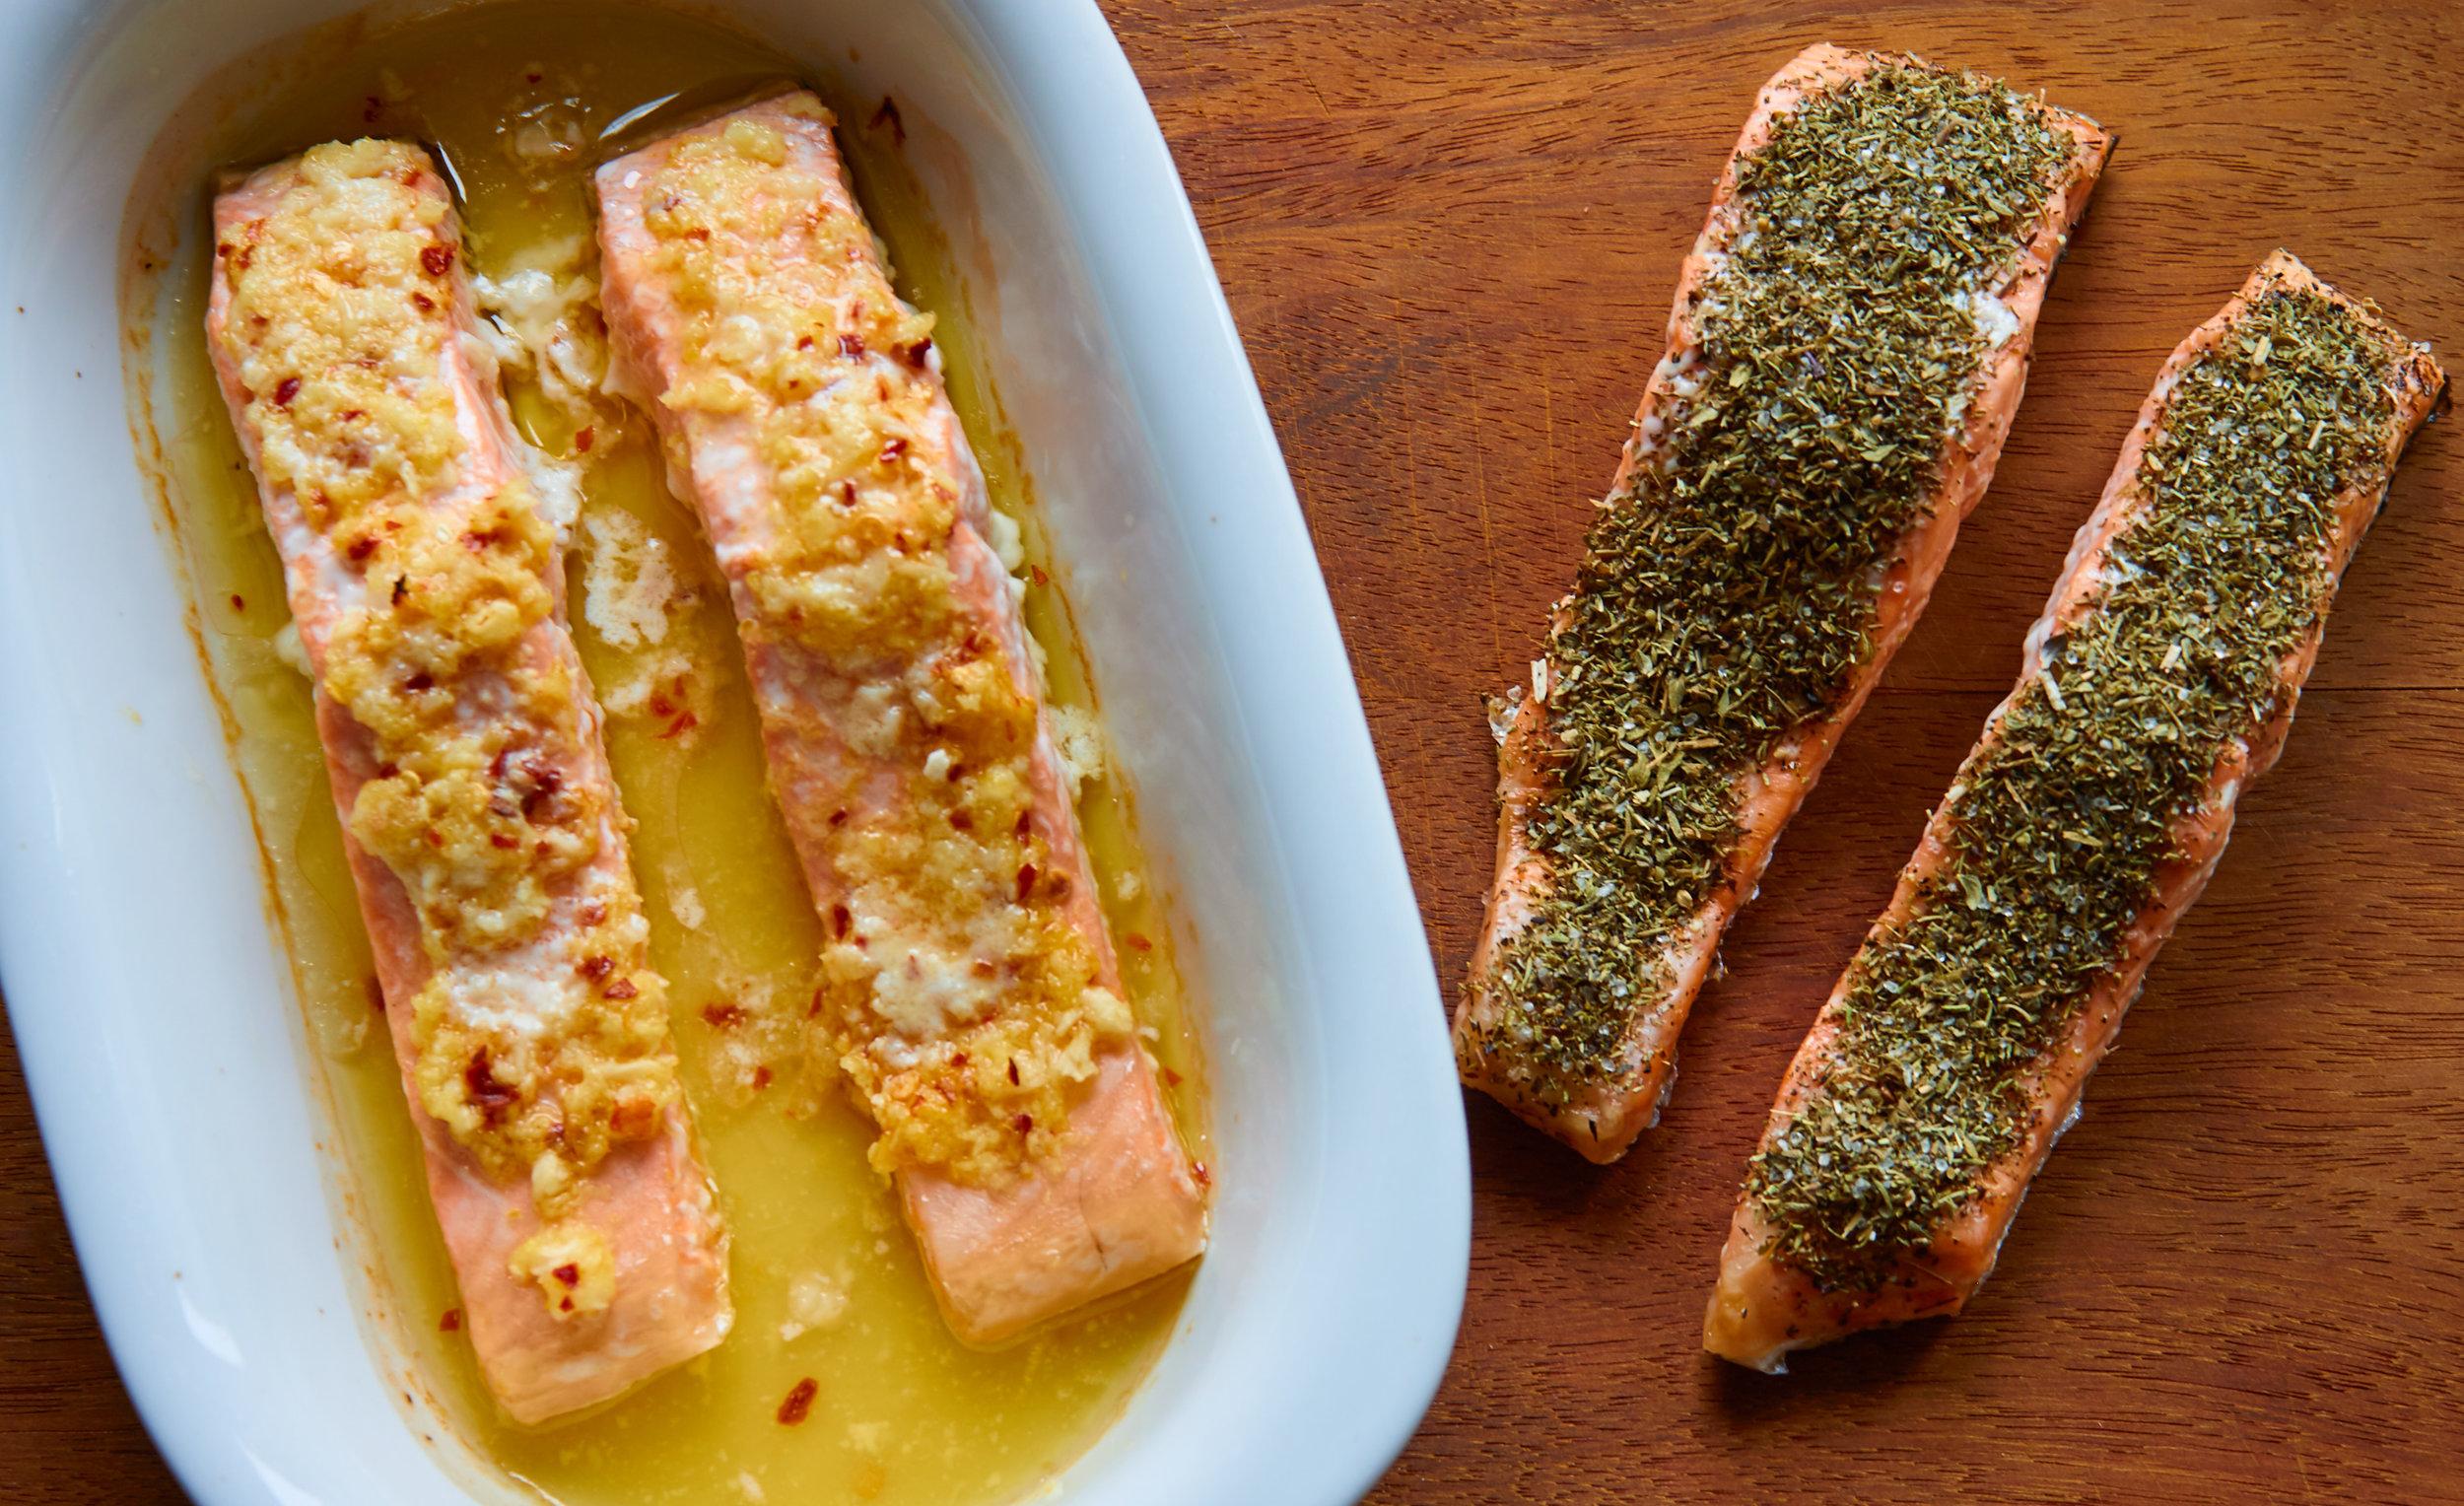 Baked Salmon 2 Ways - Herb Crusted Salmon vs Lemon-Ginger Salmon | In Carina's Kitchen